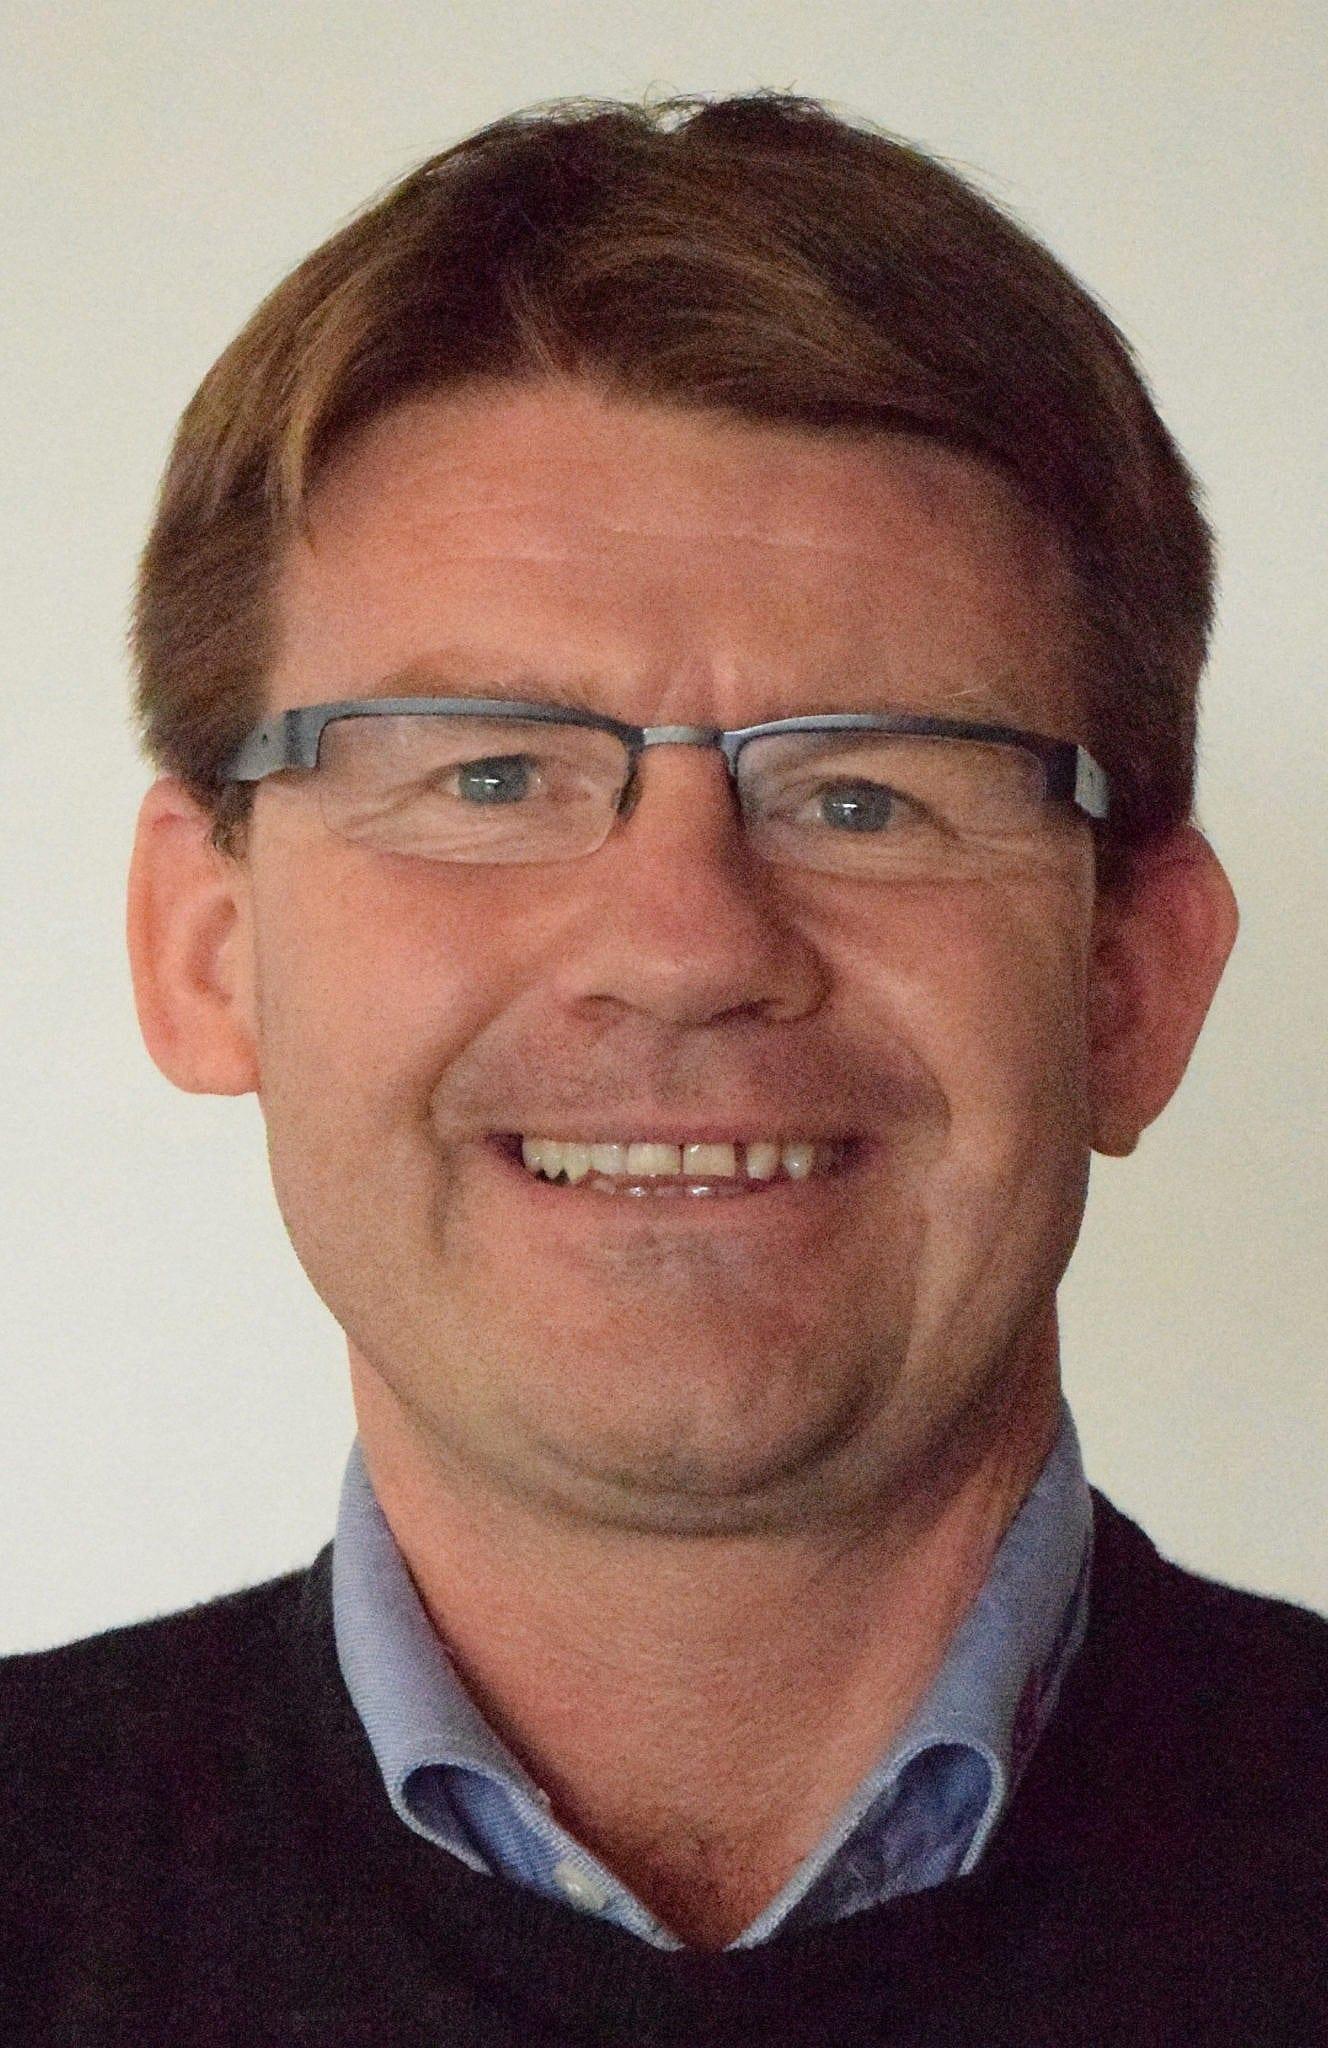 Jon Pall Einarsson